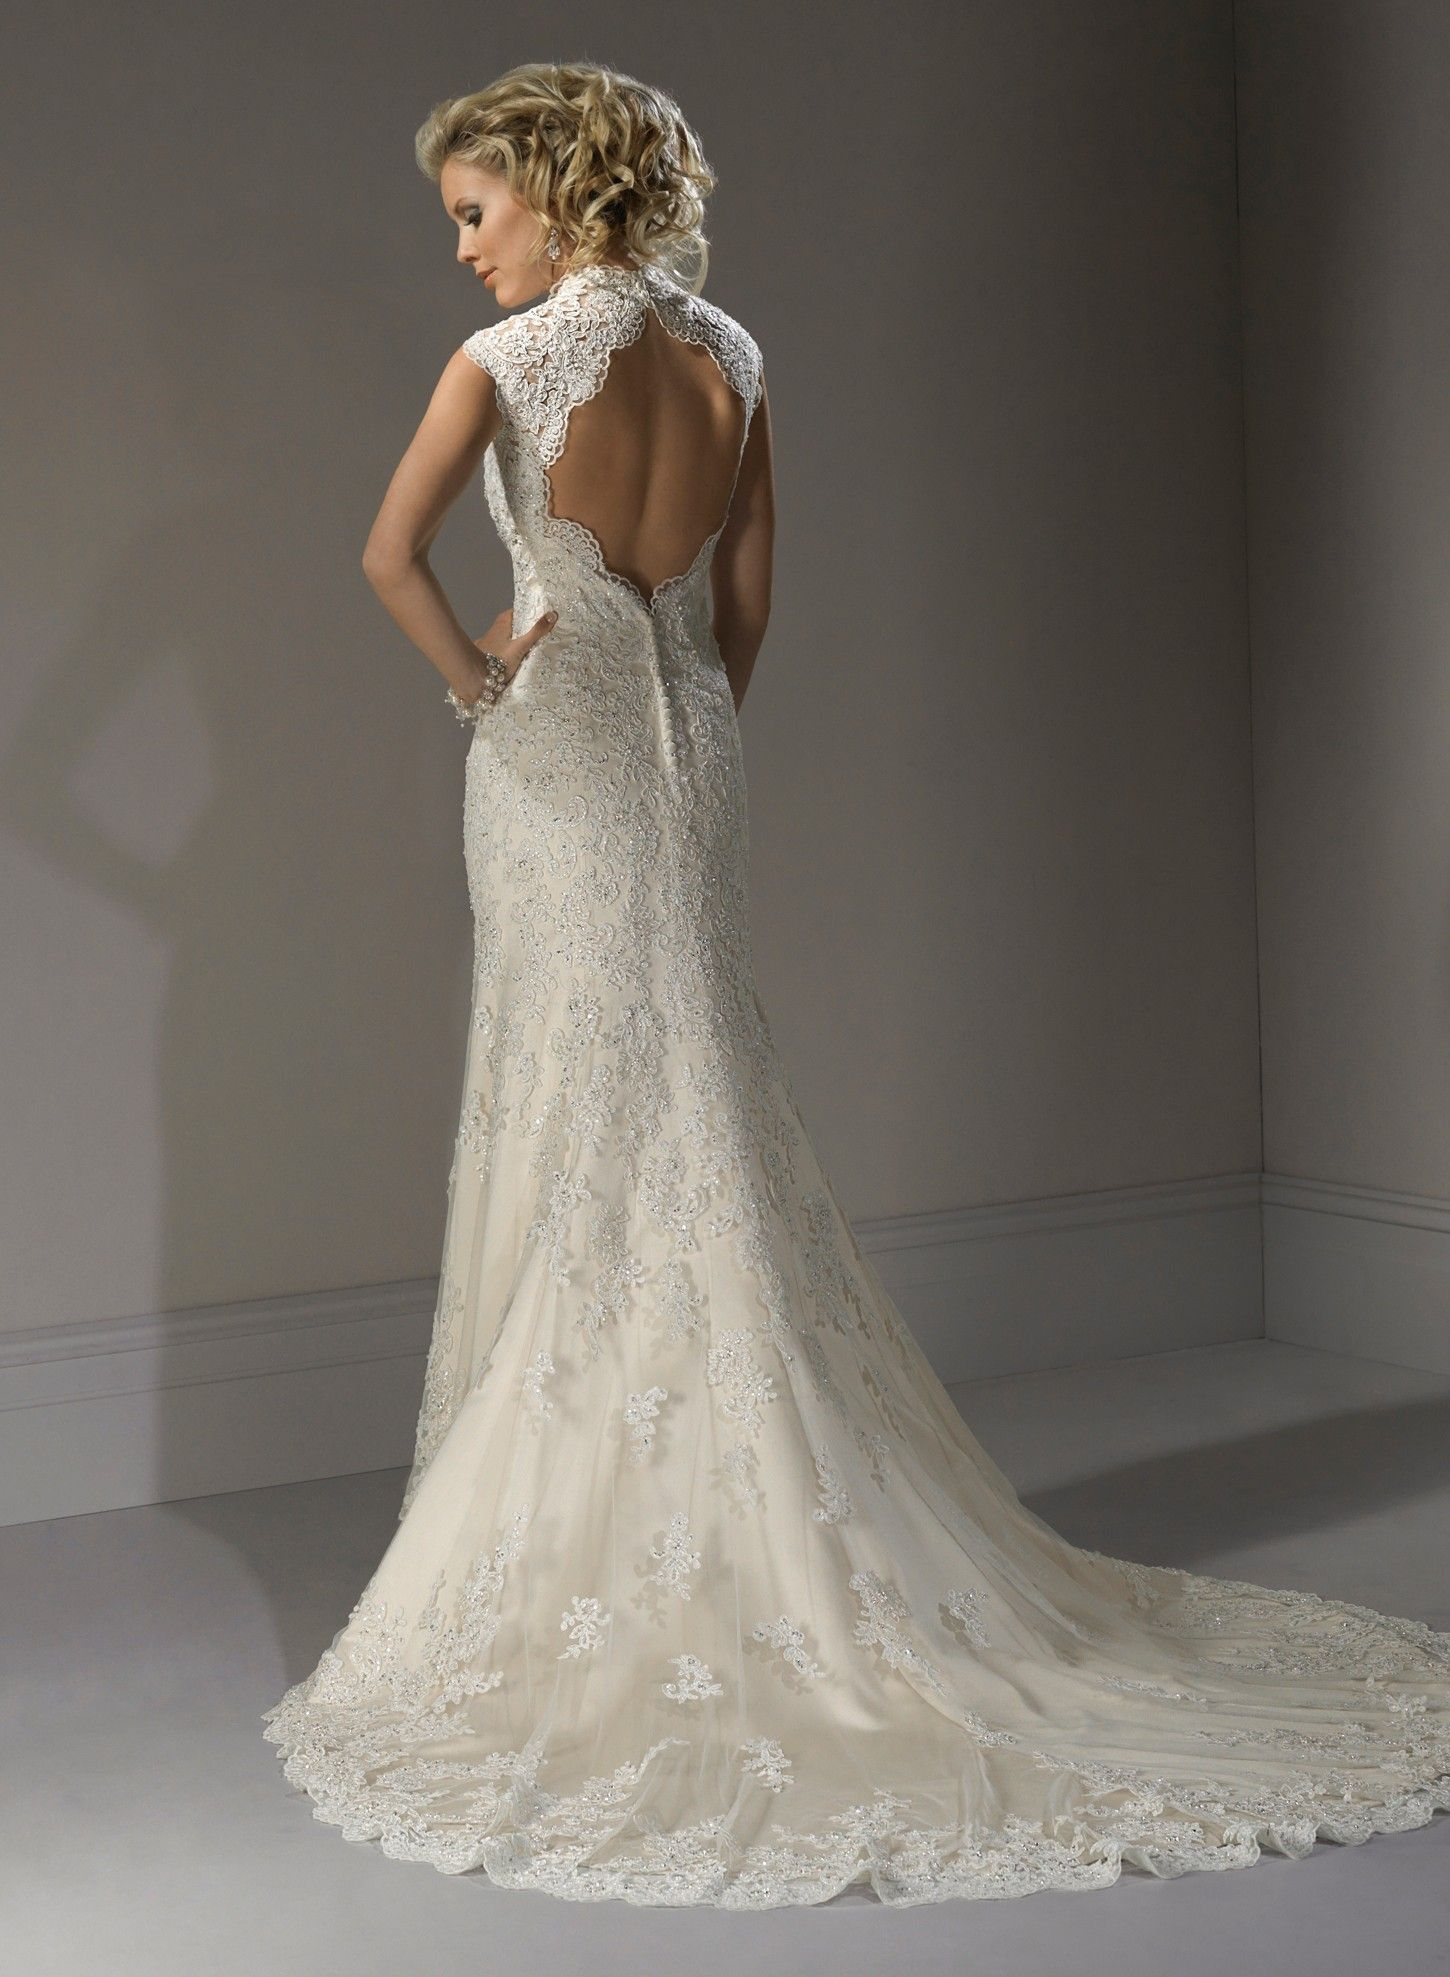 Lace cap sleeve a line wedding dress  Lace back  Wedding  Pinterest  Lace weddings Wedding dress and